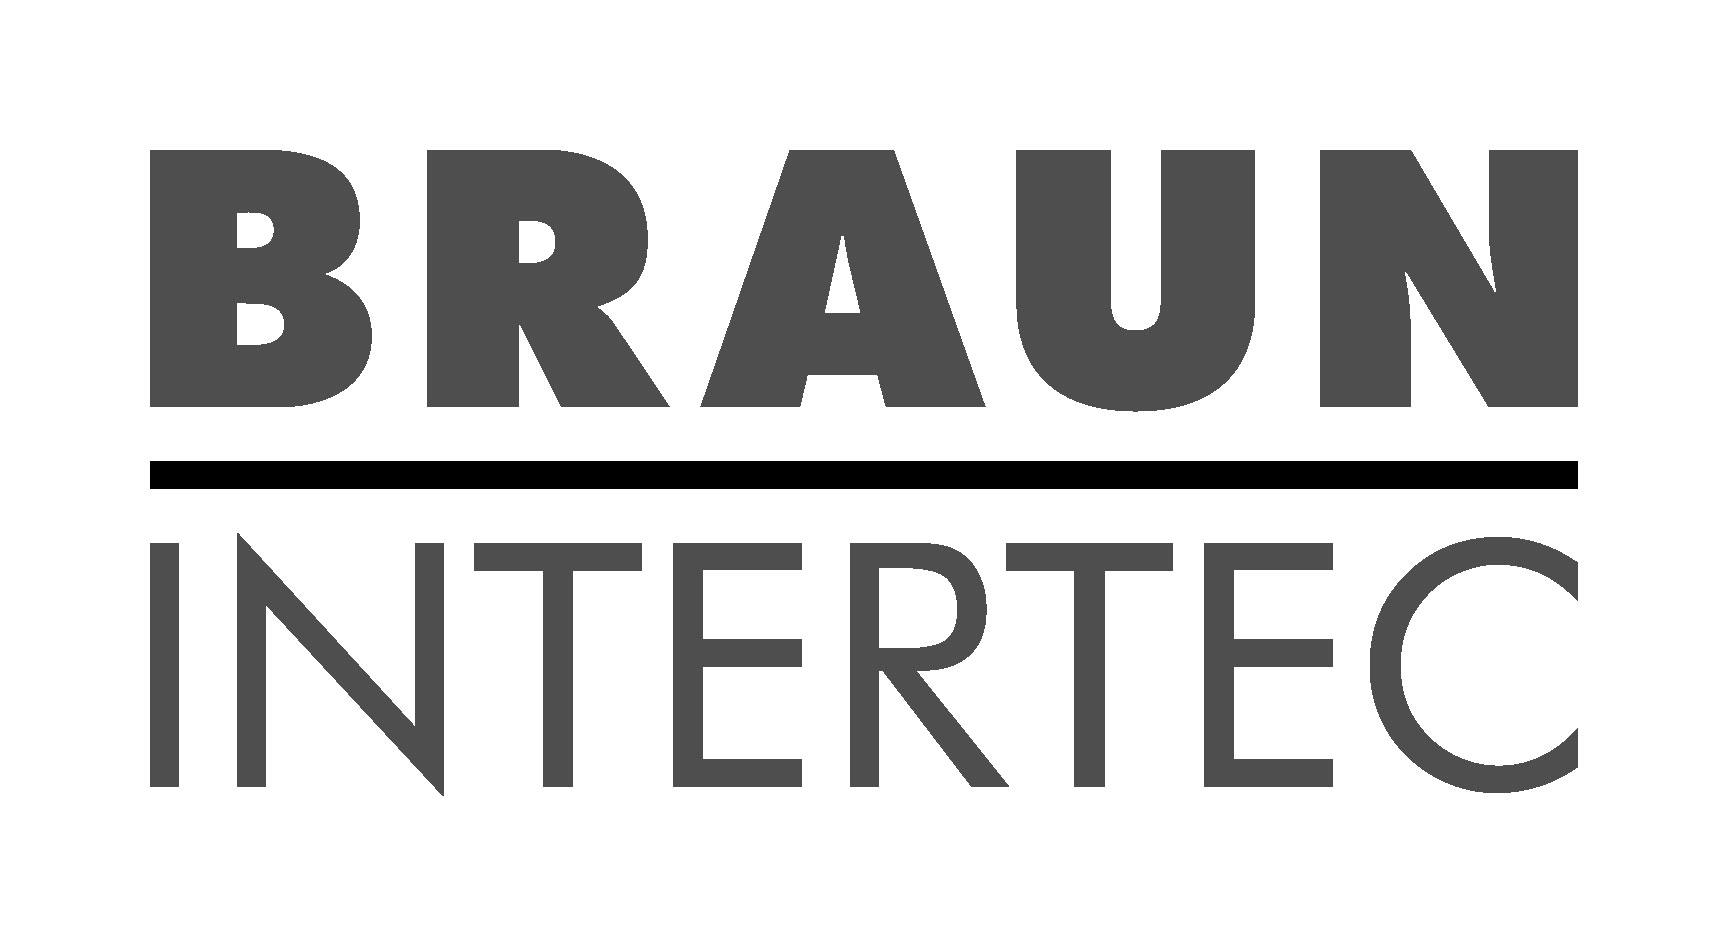 Braun-Intertec-Desaturated.jpg